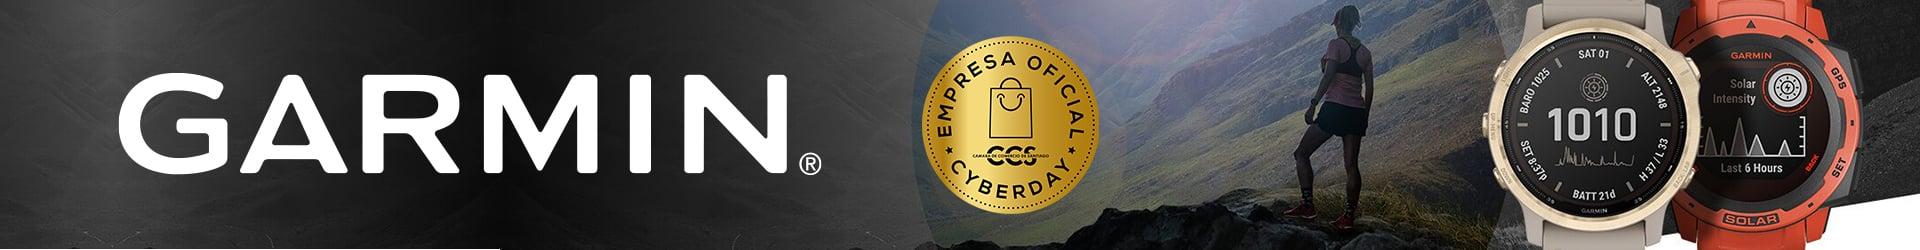 Ofertas Garmin  Cyber Day 2020